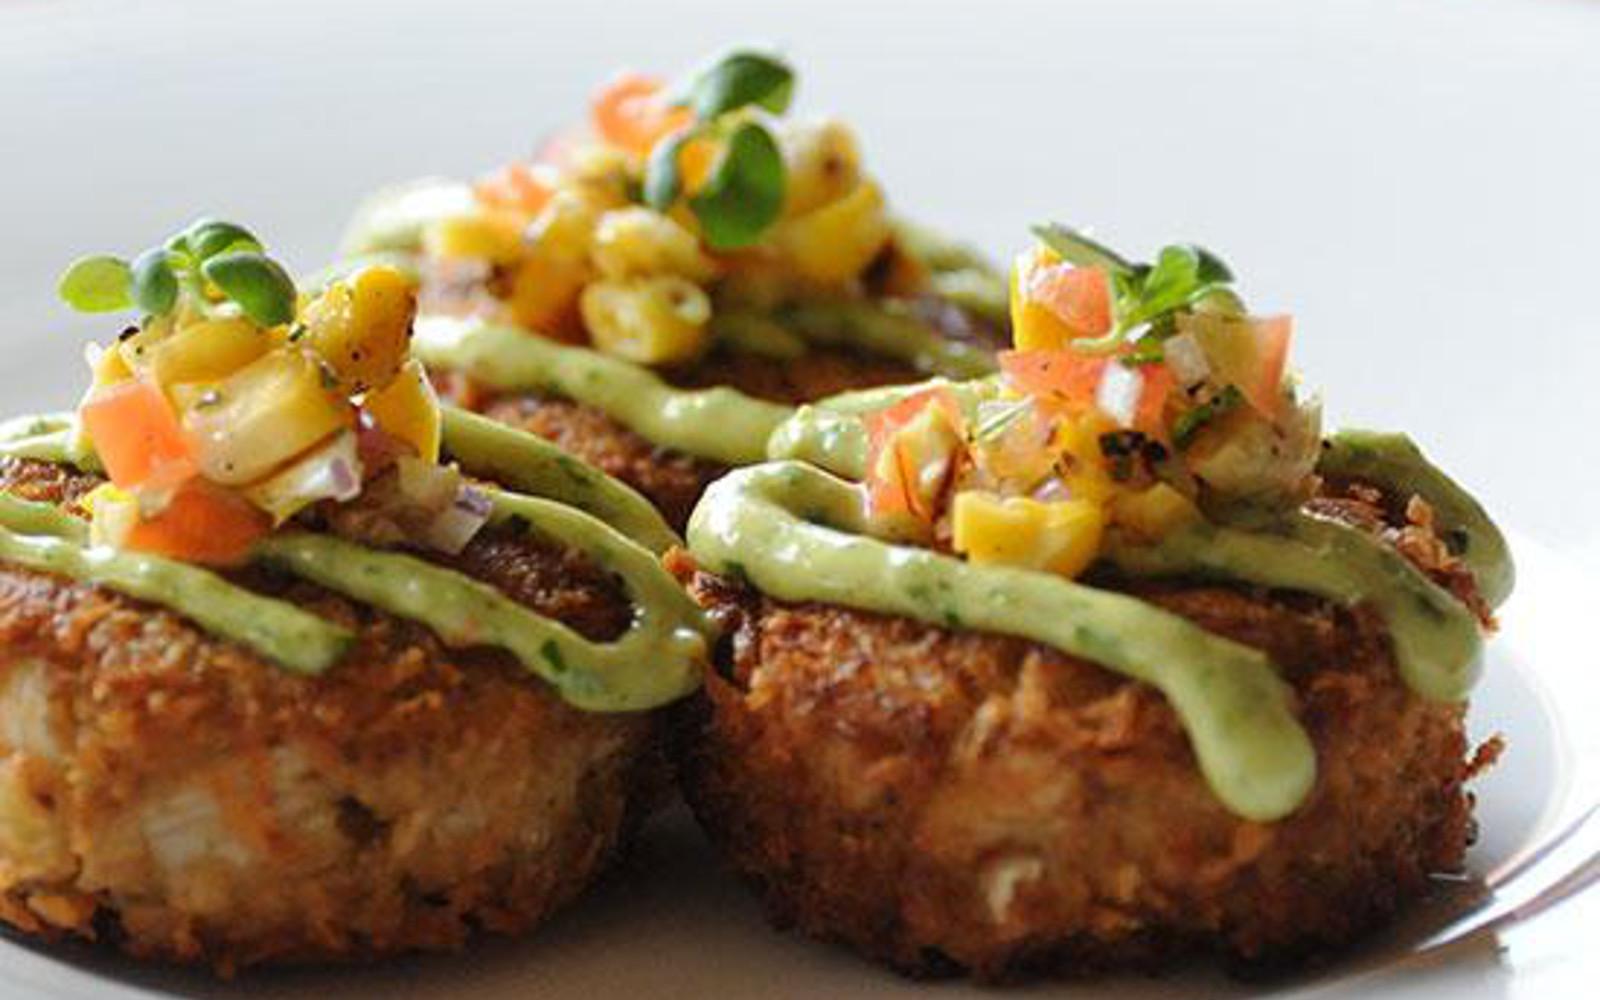 Vegan Crabcakes from Crossroads Kitchen in LA